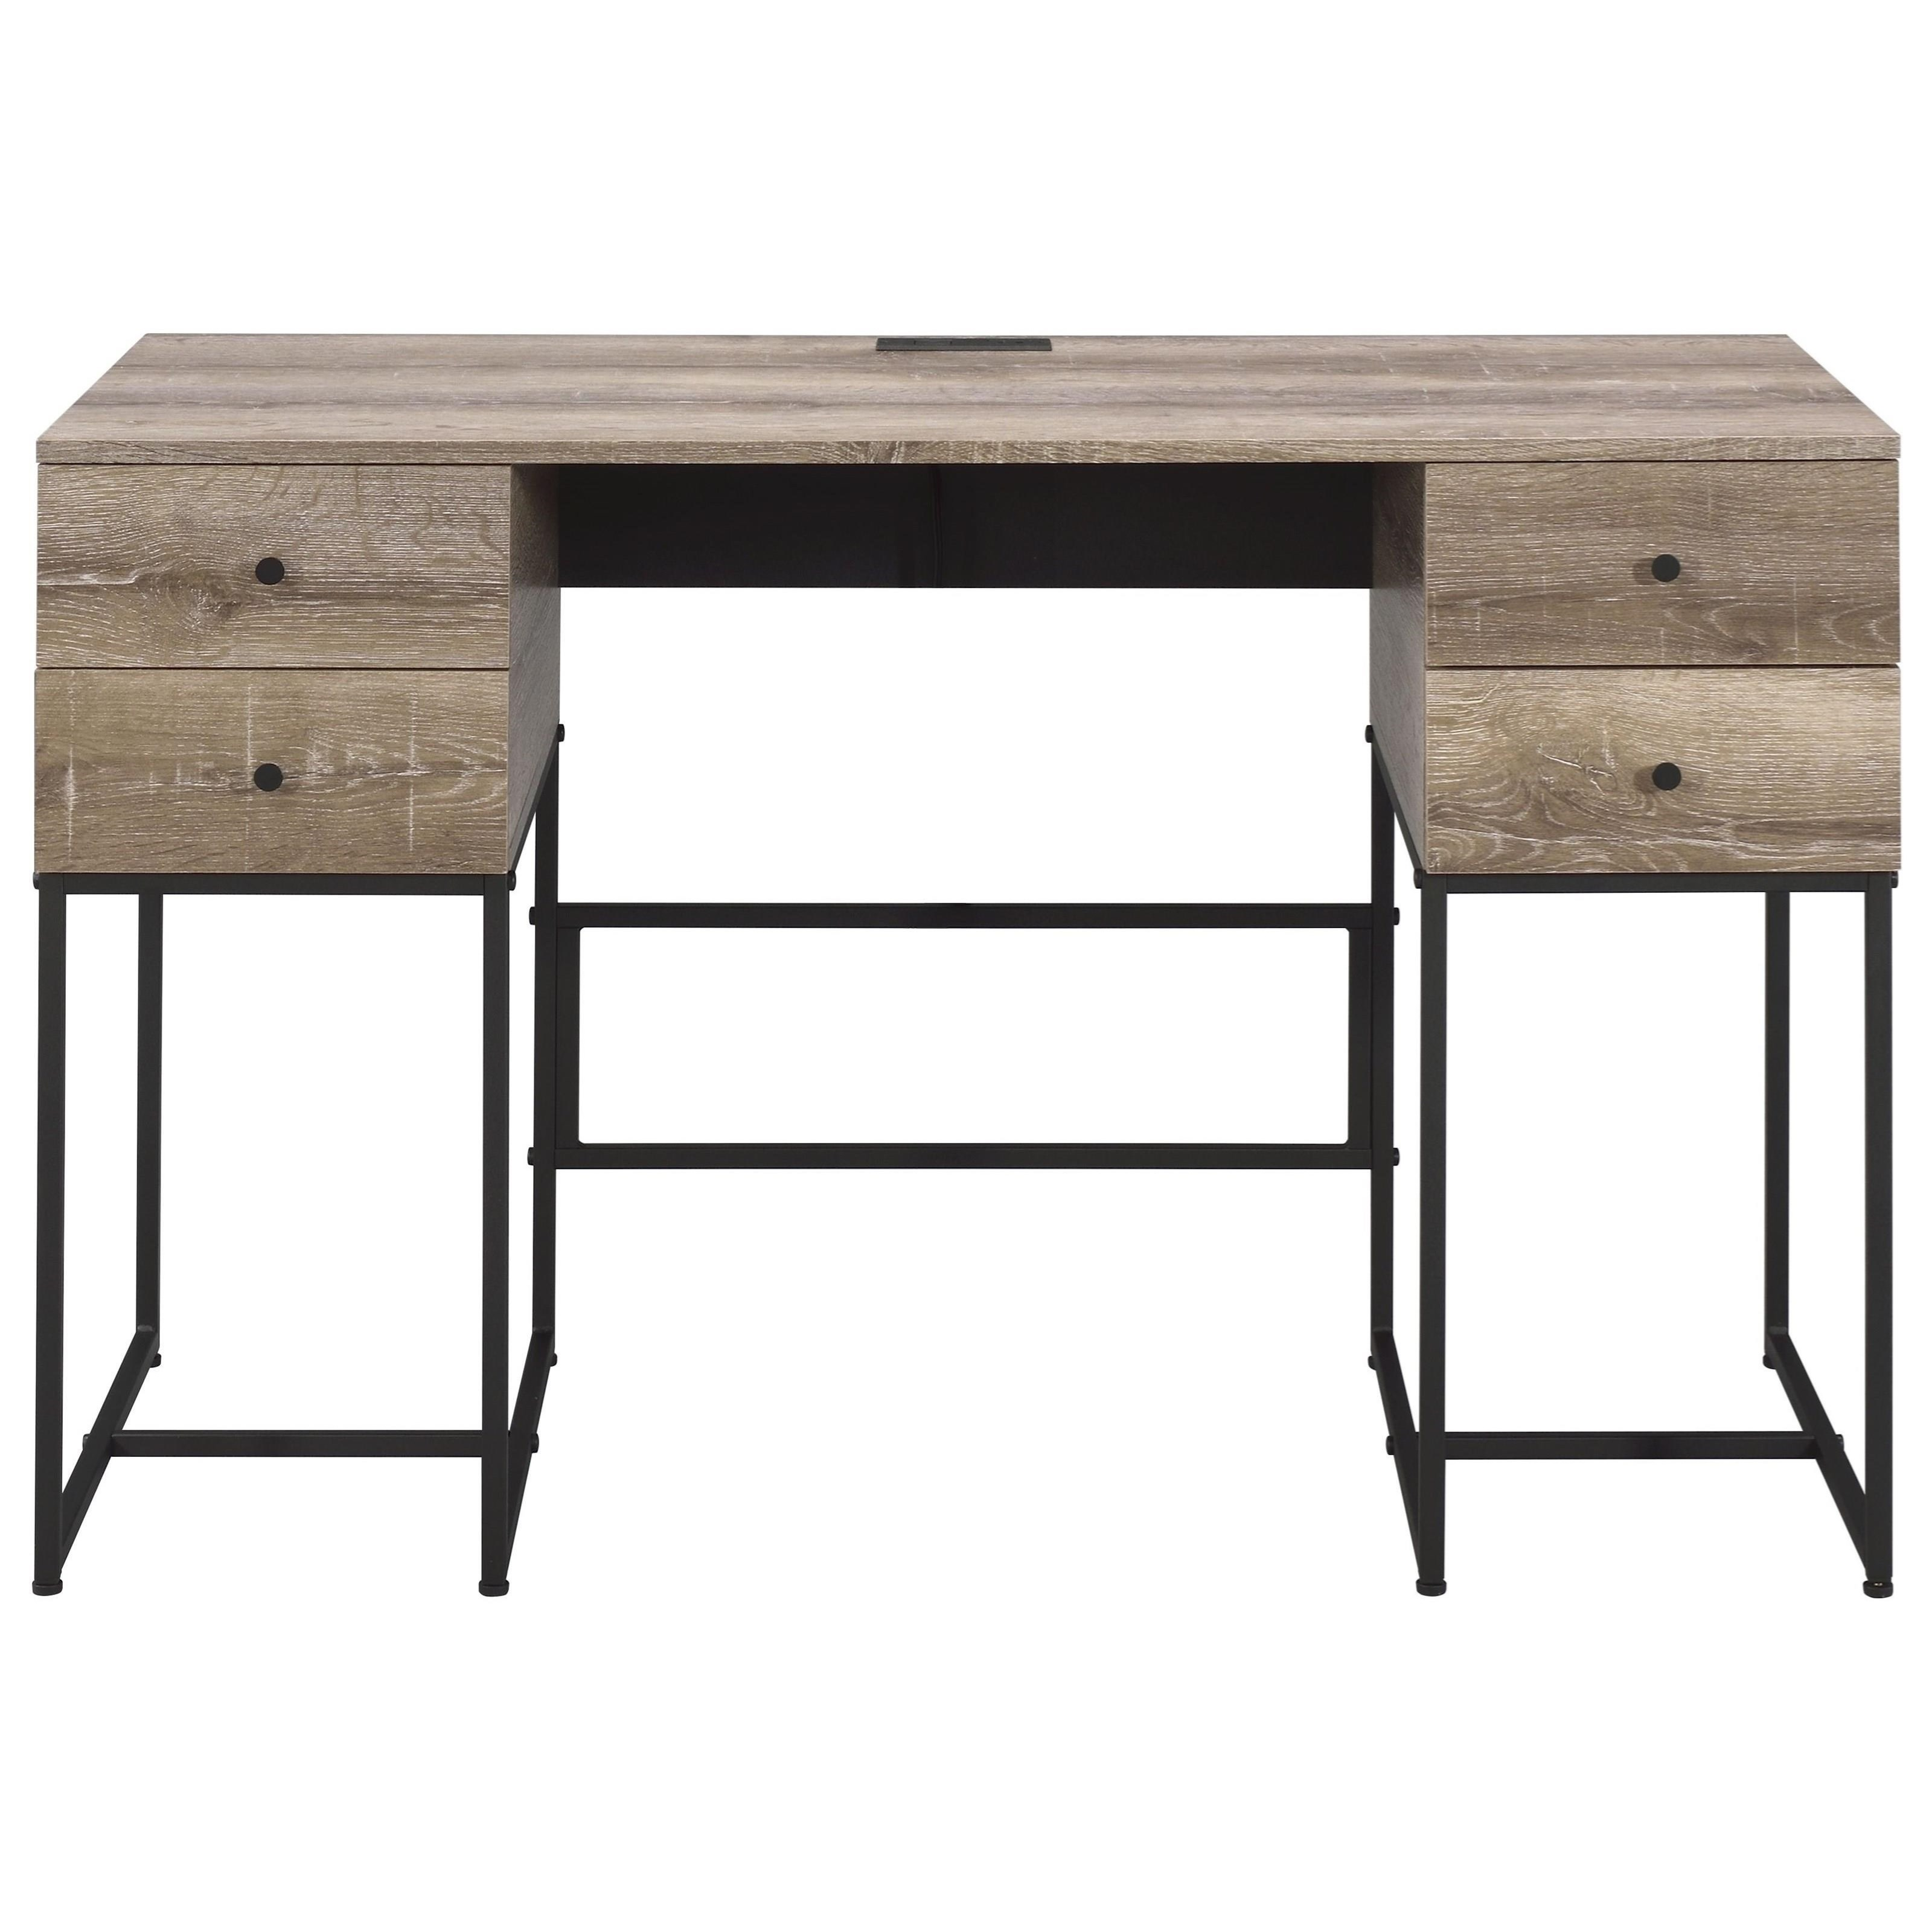 Desirre Desk by Acme Furniture at Nassau Furniture and Mattress